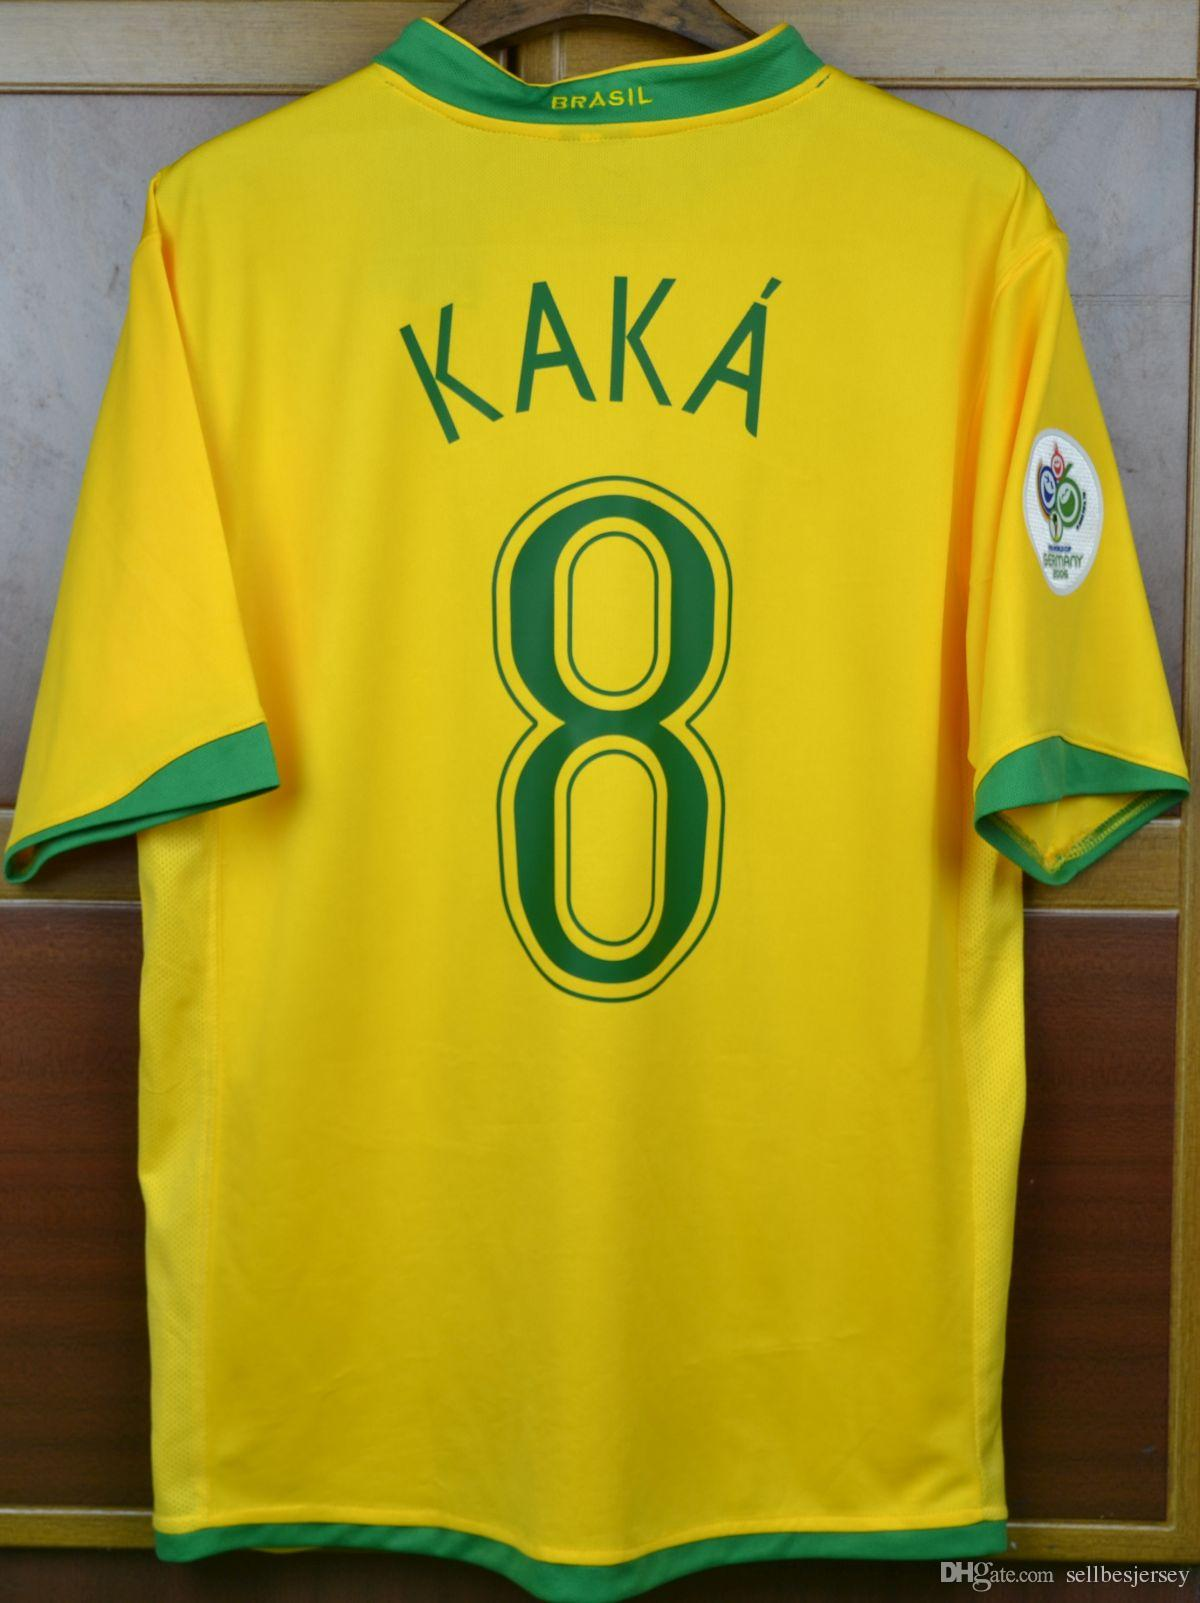 f84895ac9 2019 Brasil 06 WC Jersey Retro Jersey Brazil 2006 Ronaldo KAKA Carlos  Ronaldinho Adriano Jerseys Shirt Short Sleeve From Sellbesjersey